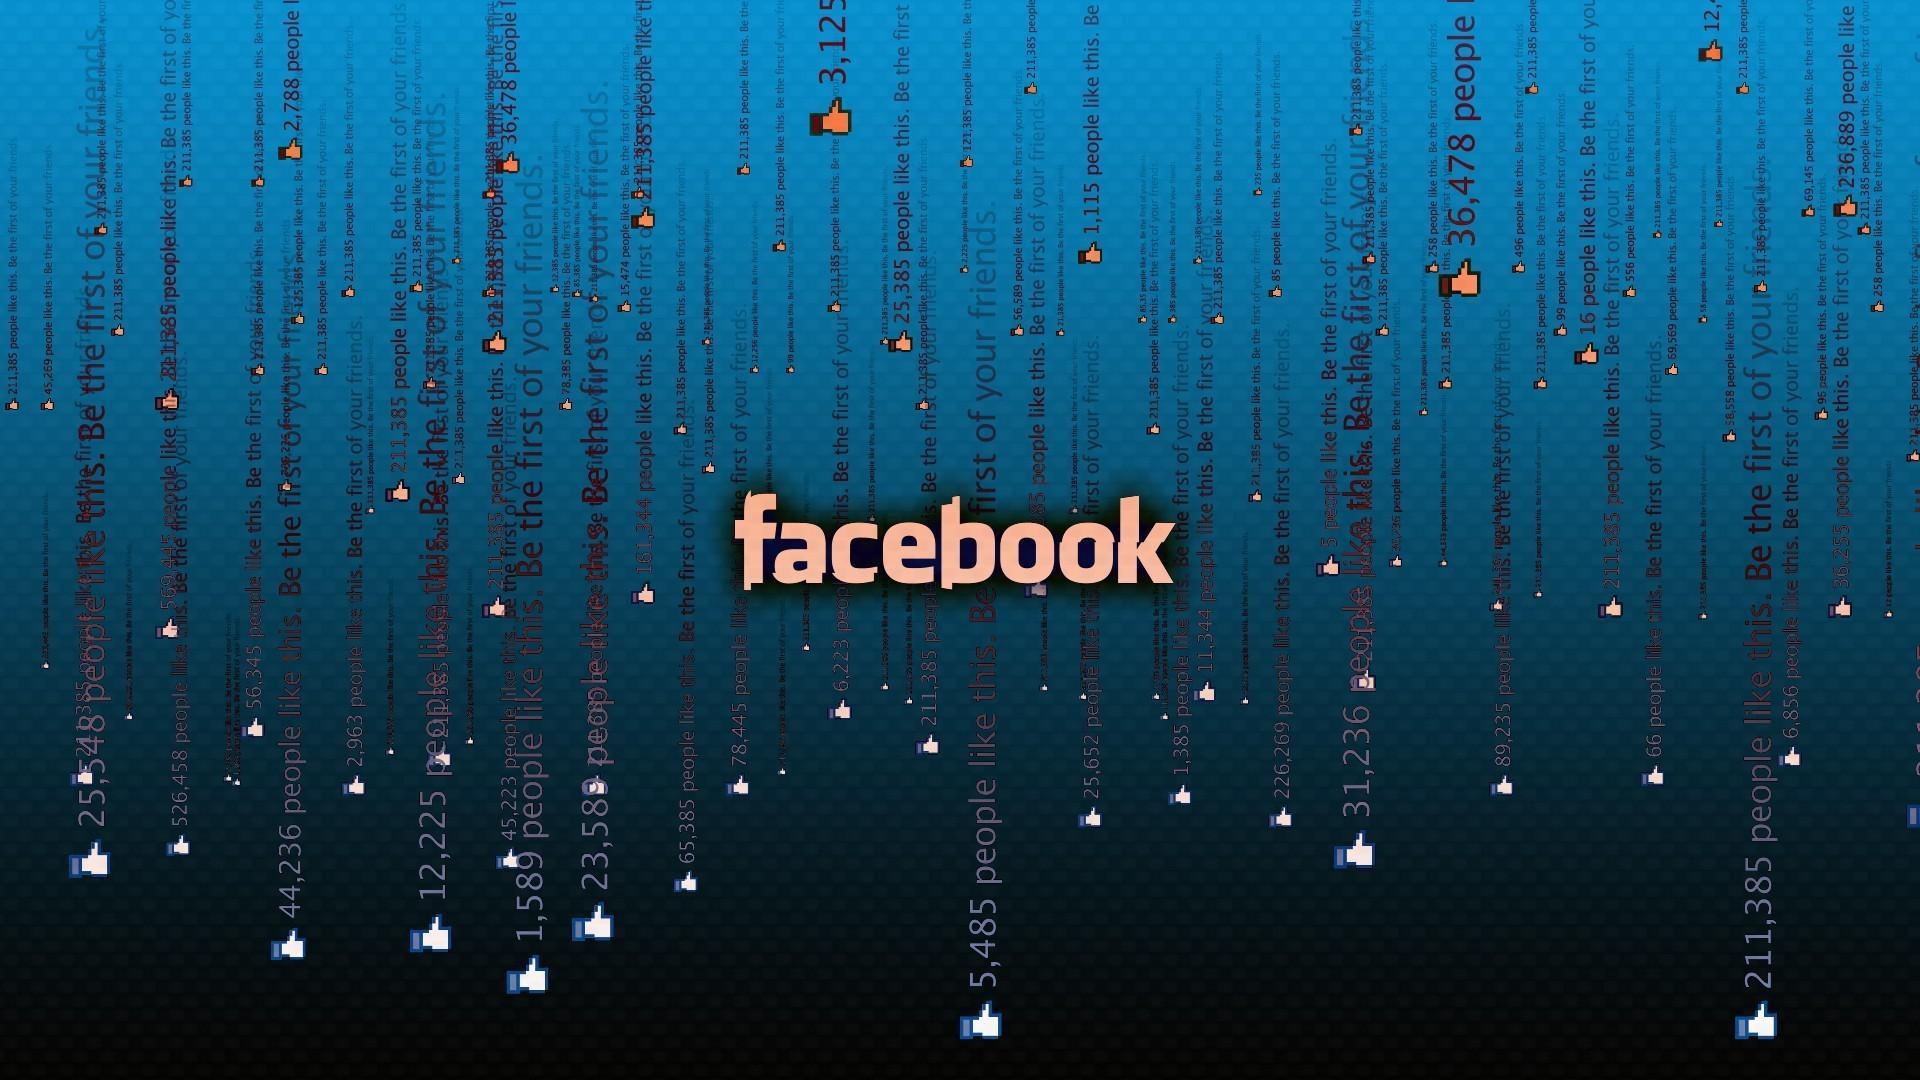 Facebook matrix blue wallpaper